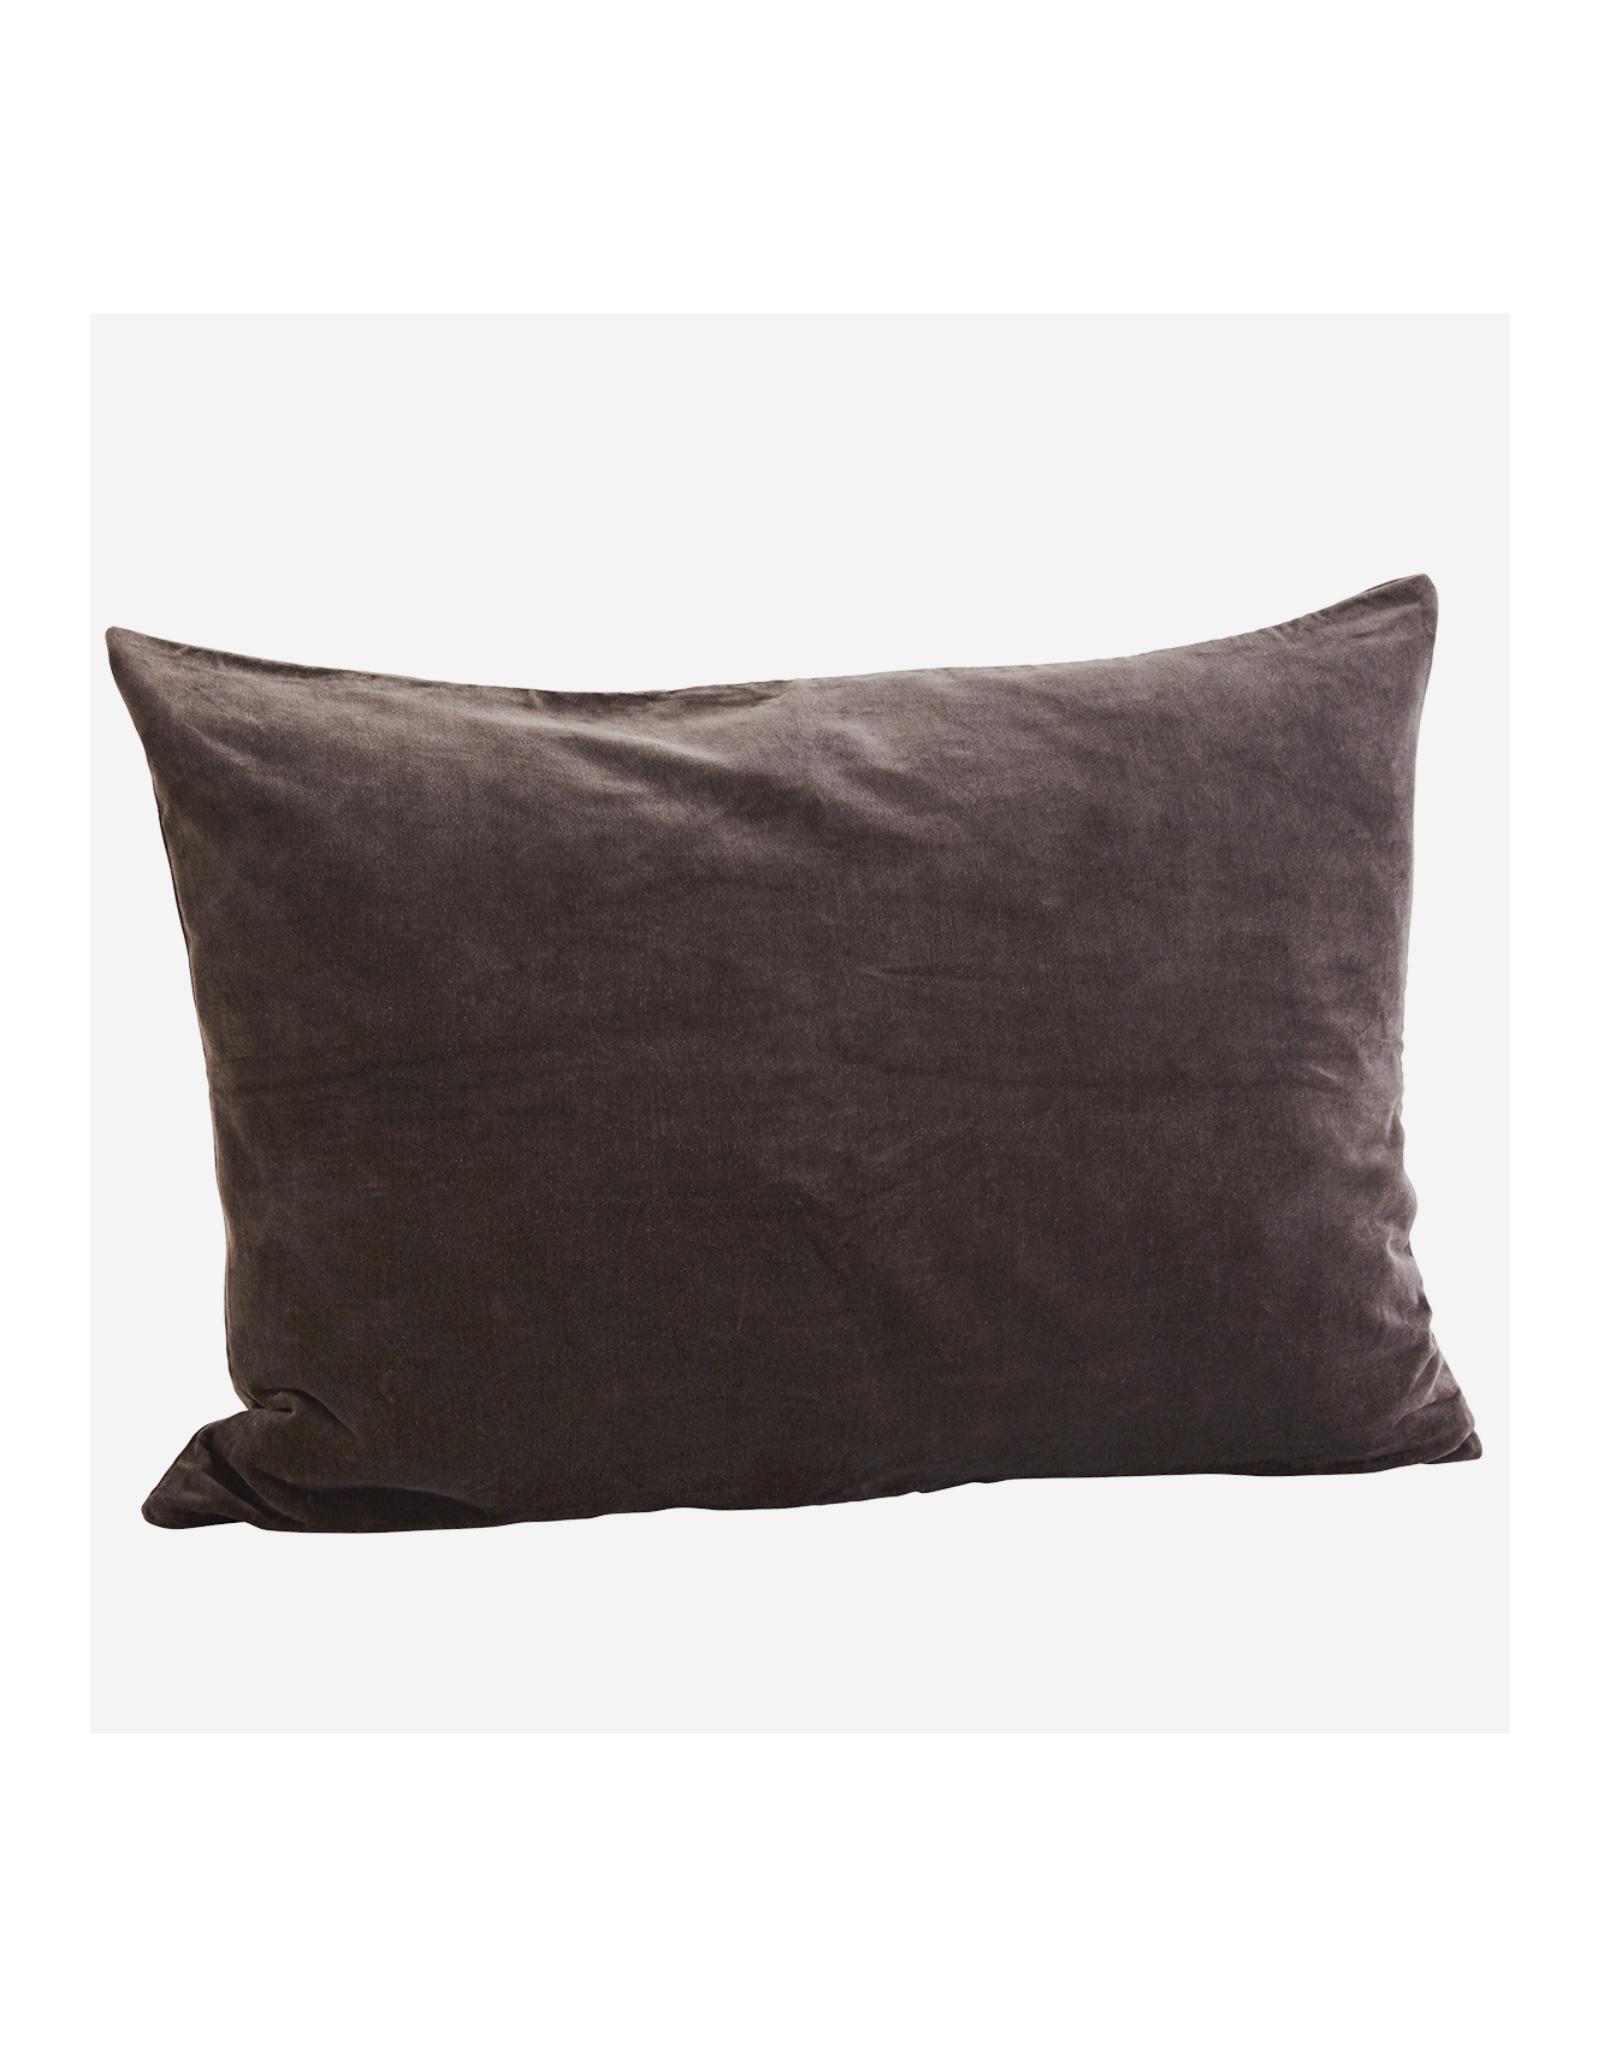 Kussensloop Charcoal Washed Velvet 50 x 70